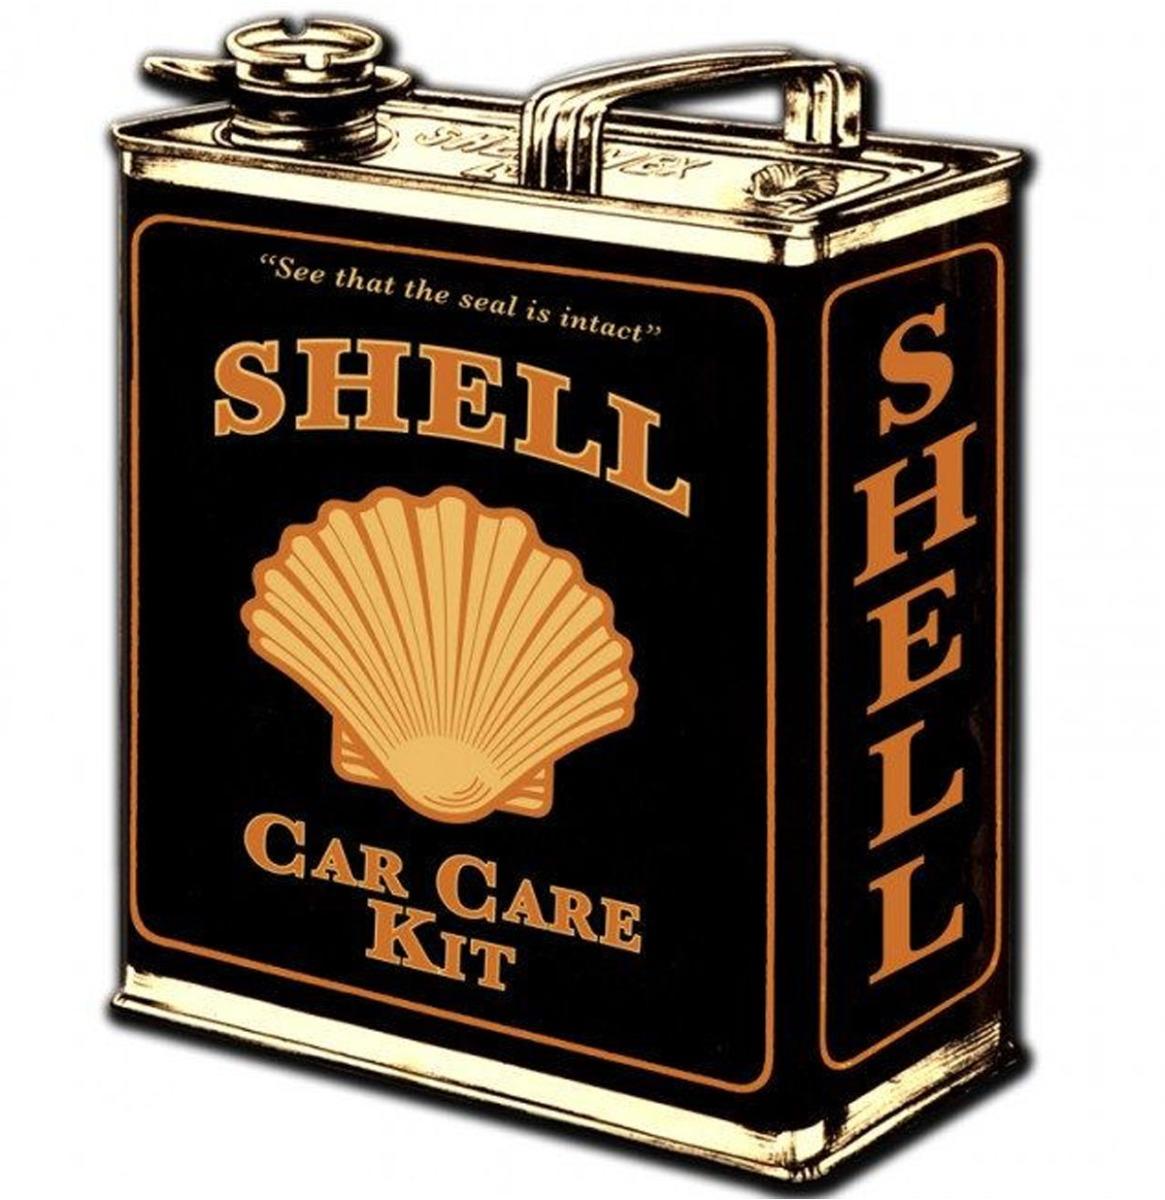 fiftiesstore Shell Motor Oil - Olieblik Zwaar Metalen Bord - 36 x 29 cm